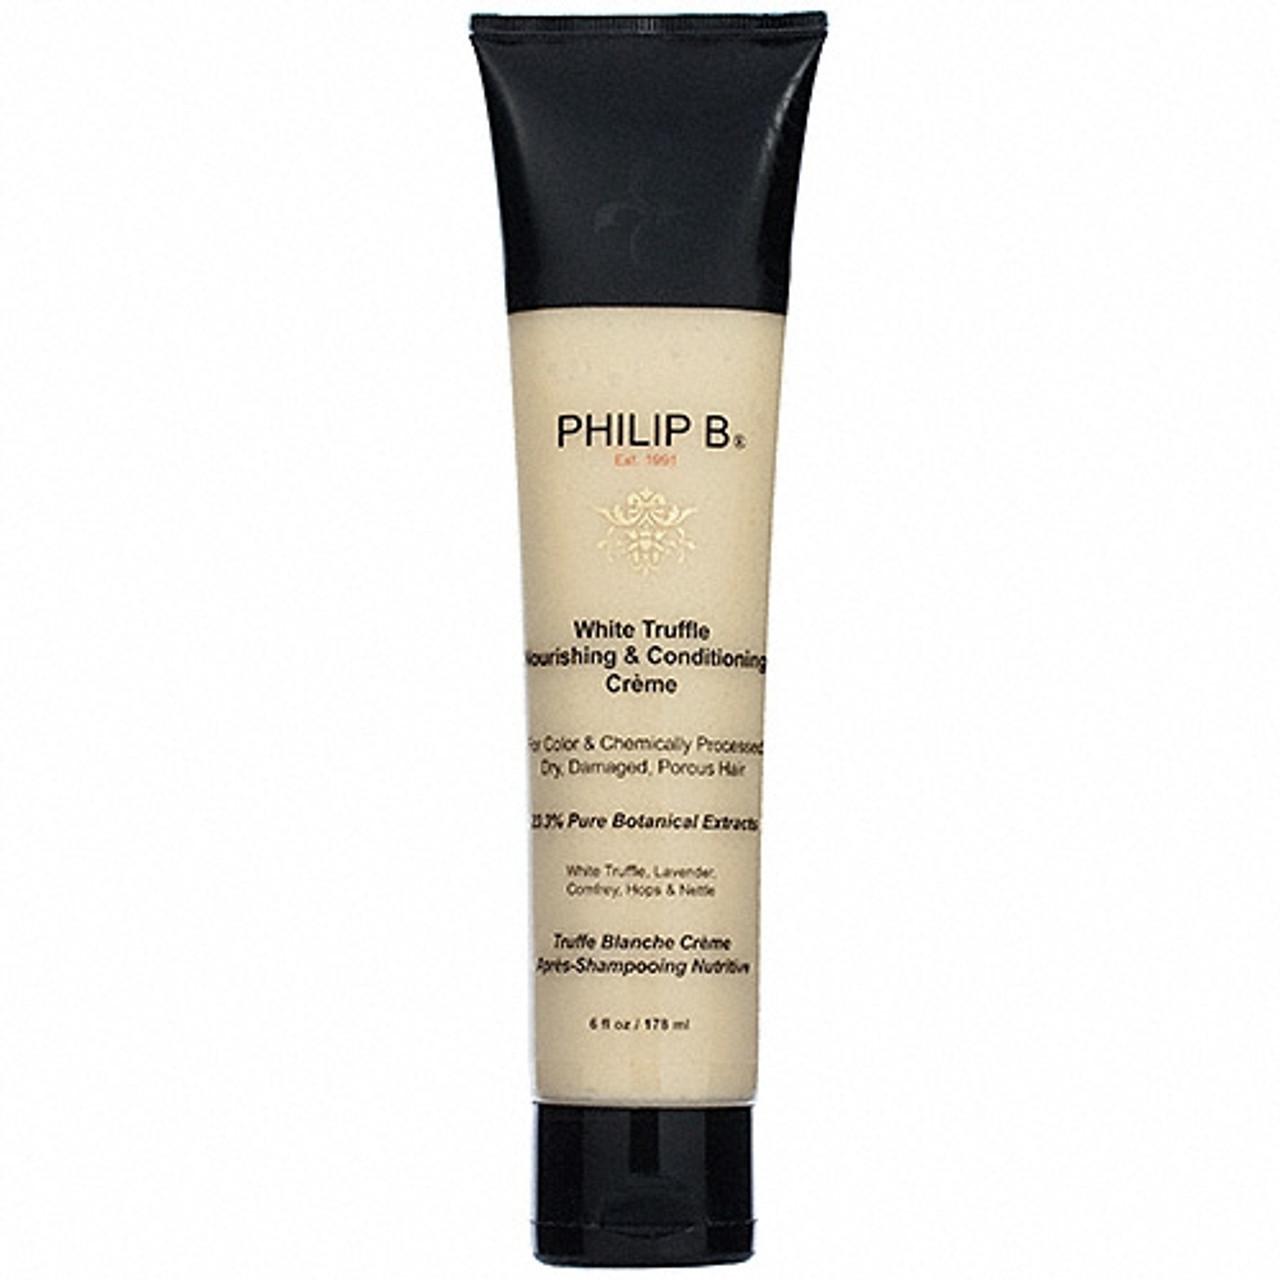 Philip B White Truffle Nourishing & Conditioning Crème 6 oz